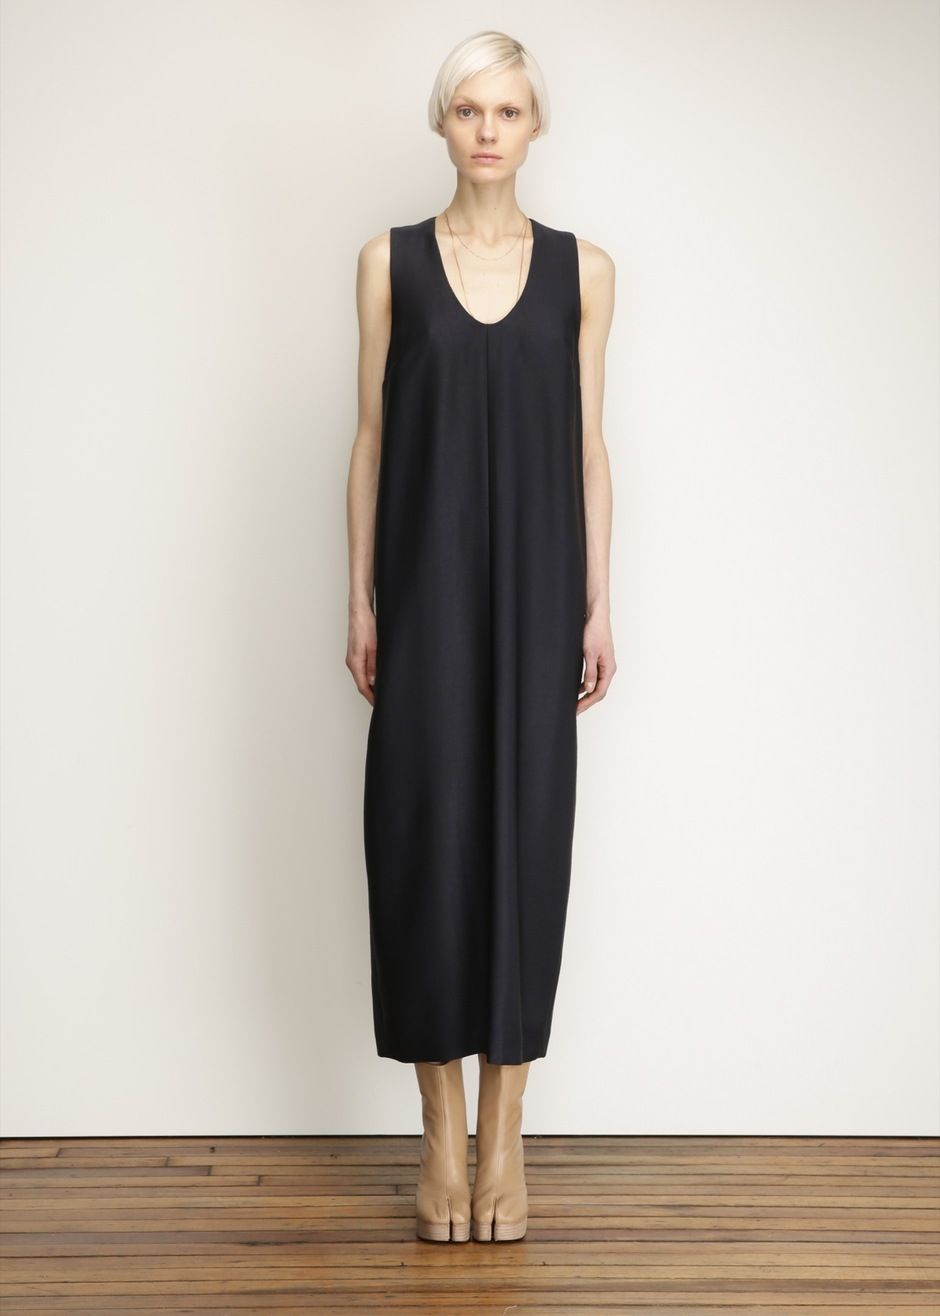 Suzanne Rae Exclusive Long Tank Dress (Blue / Black)